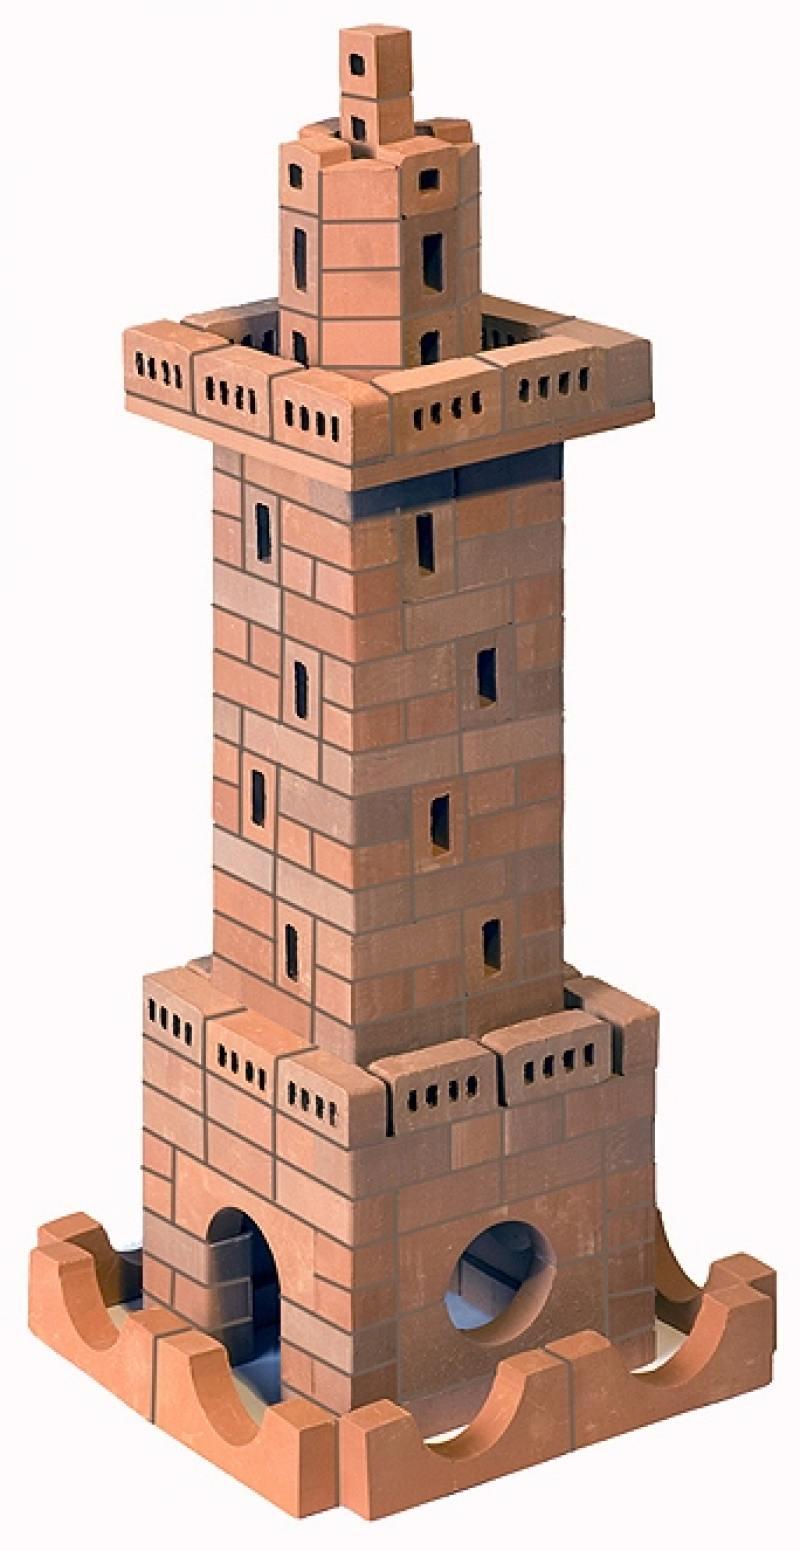 Конструктор Brickmaster Маяк 230 элементов 203 конструктор brickmaster кремль 136 элементов 208